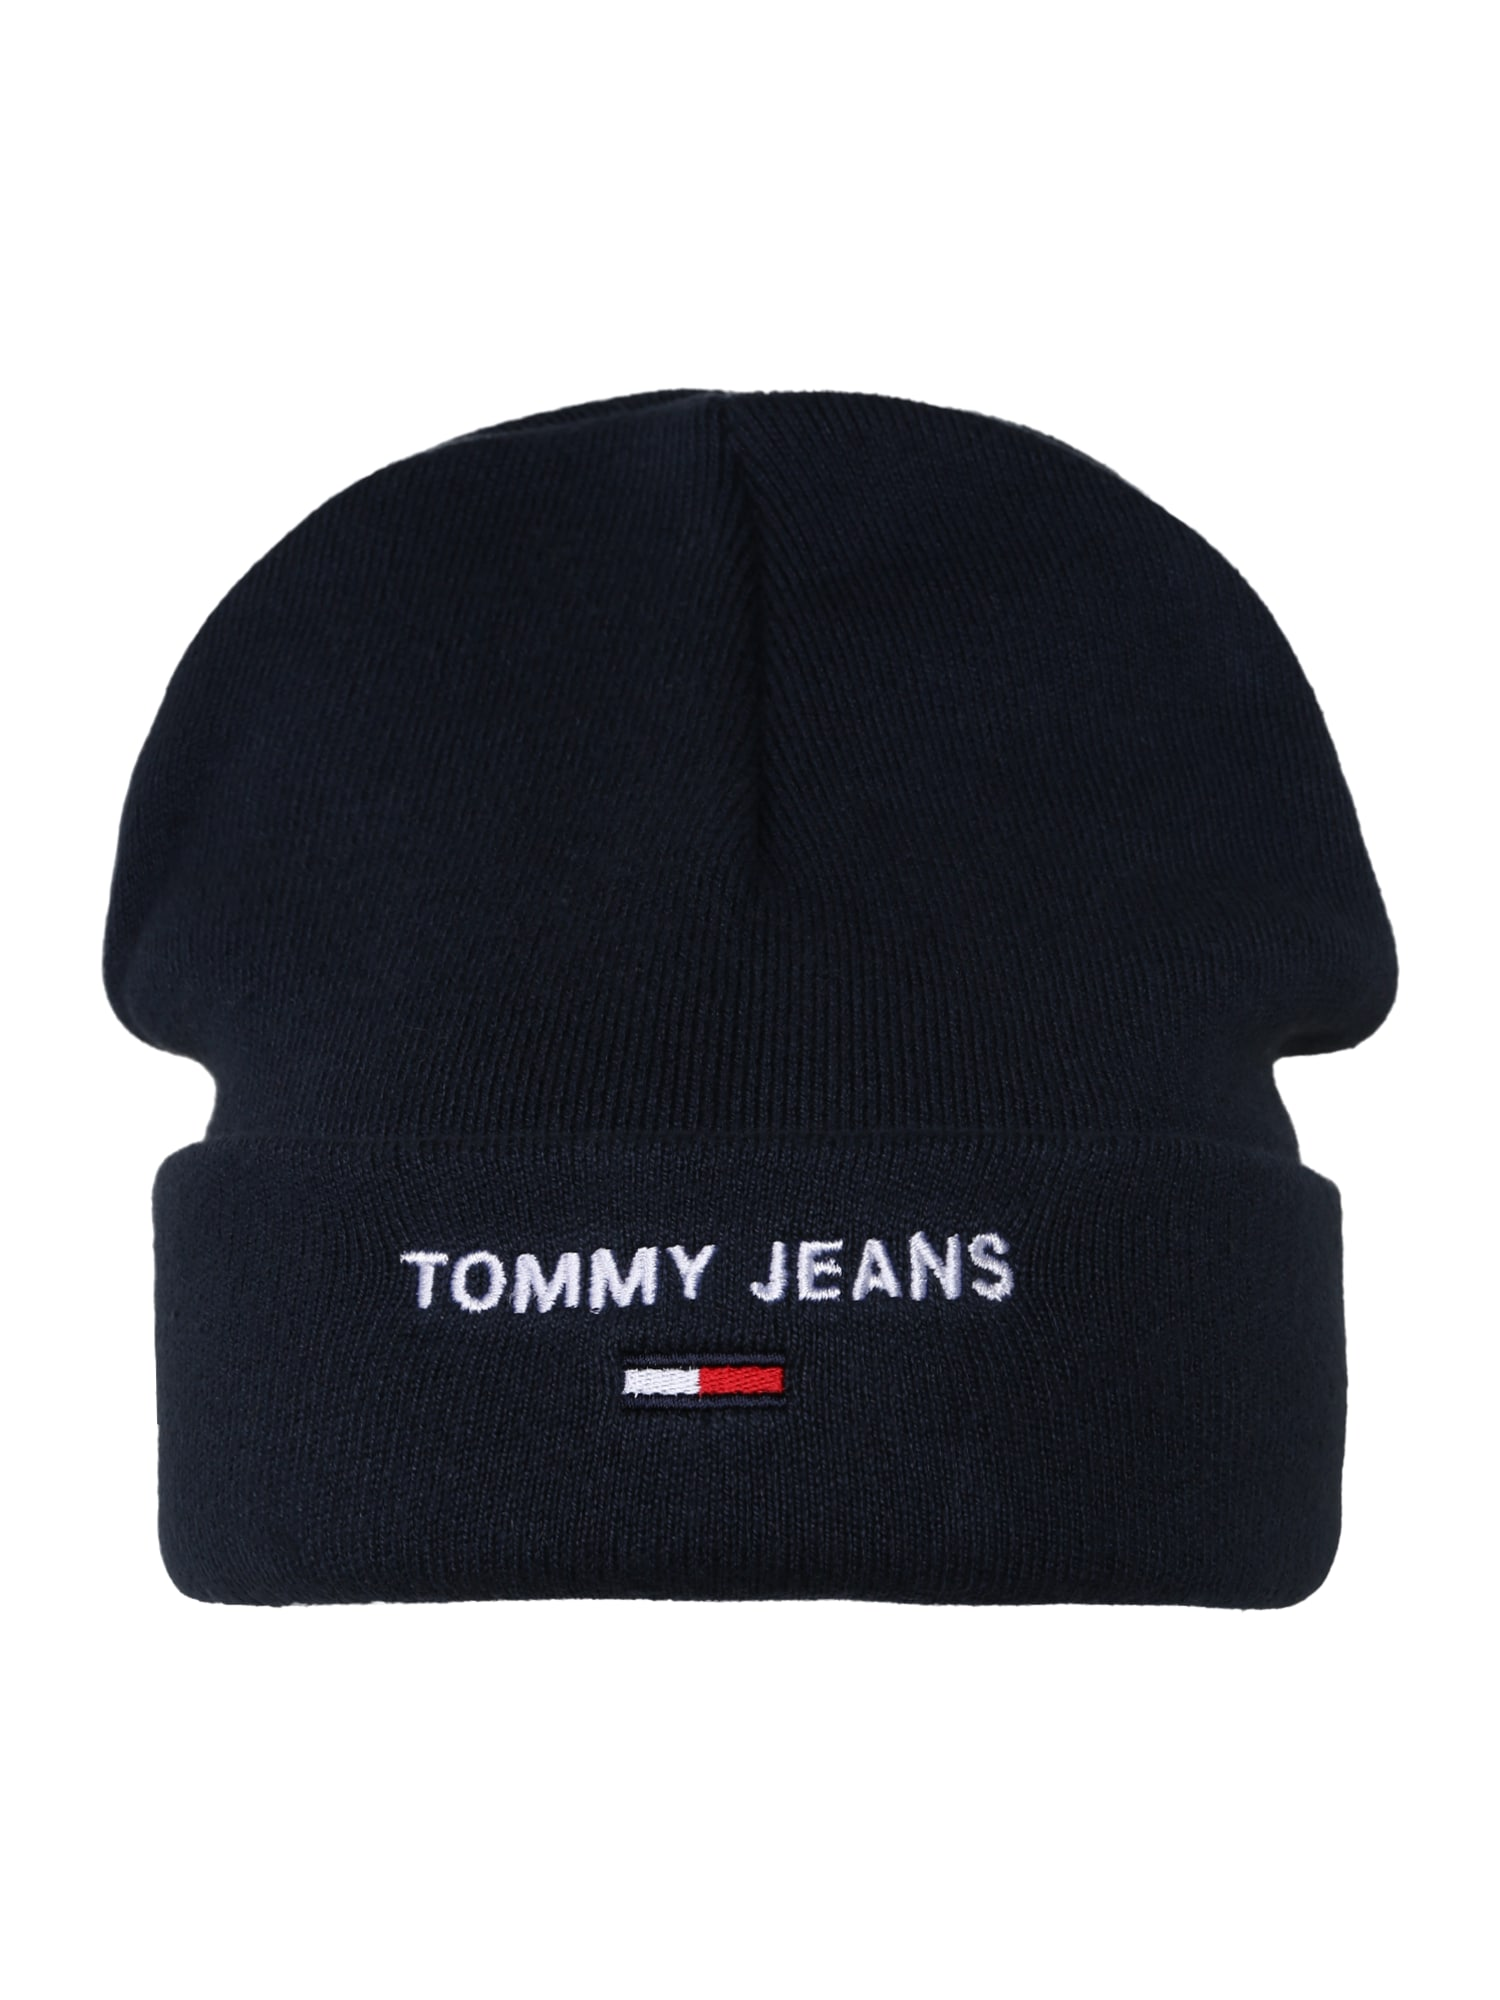 Tommy Jeans Megzta kepurė tamsiai mėlyna / balta / raudona